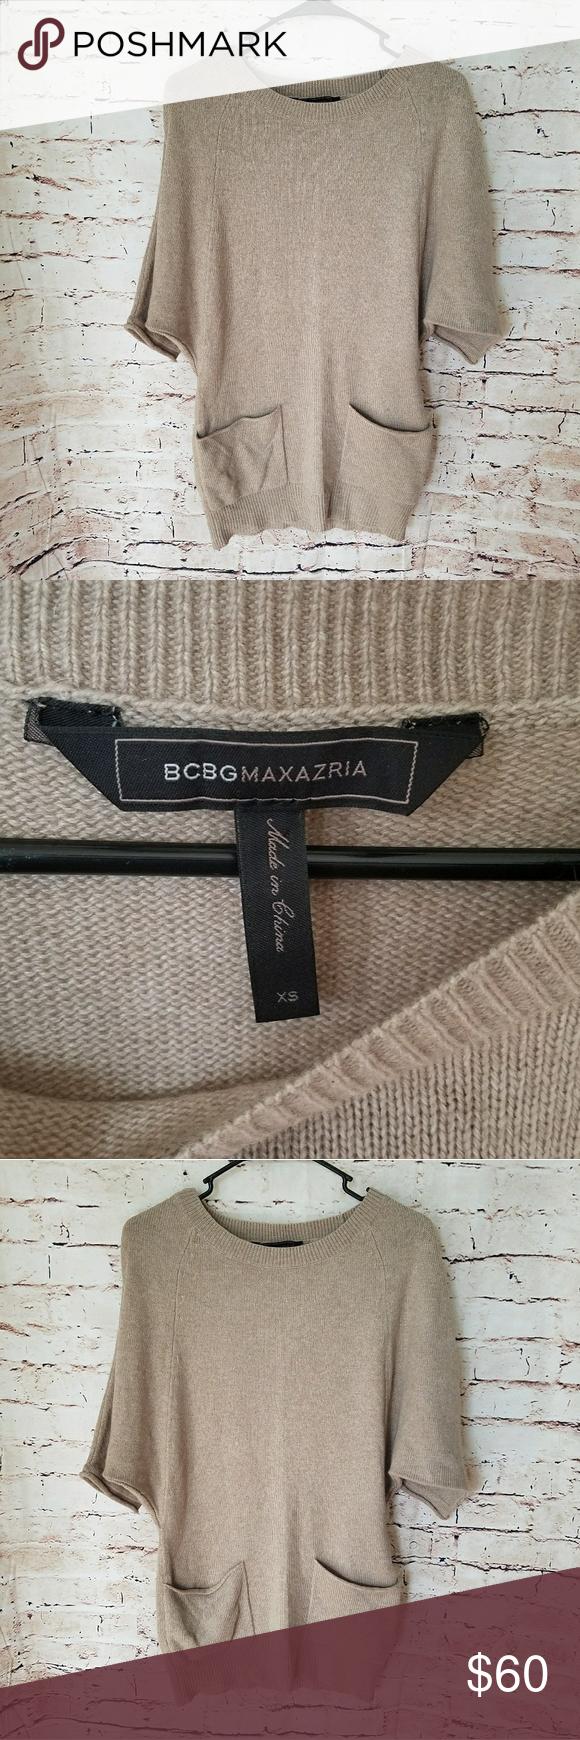 Bcbg sweater Very great fall sweater BCBGMaxAzria Sweaters